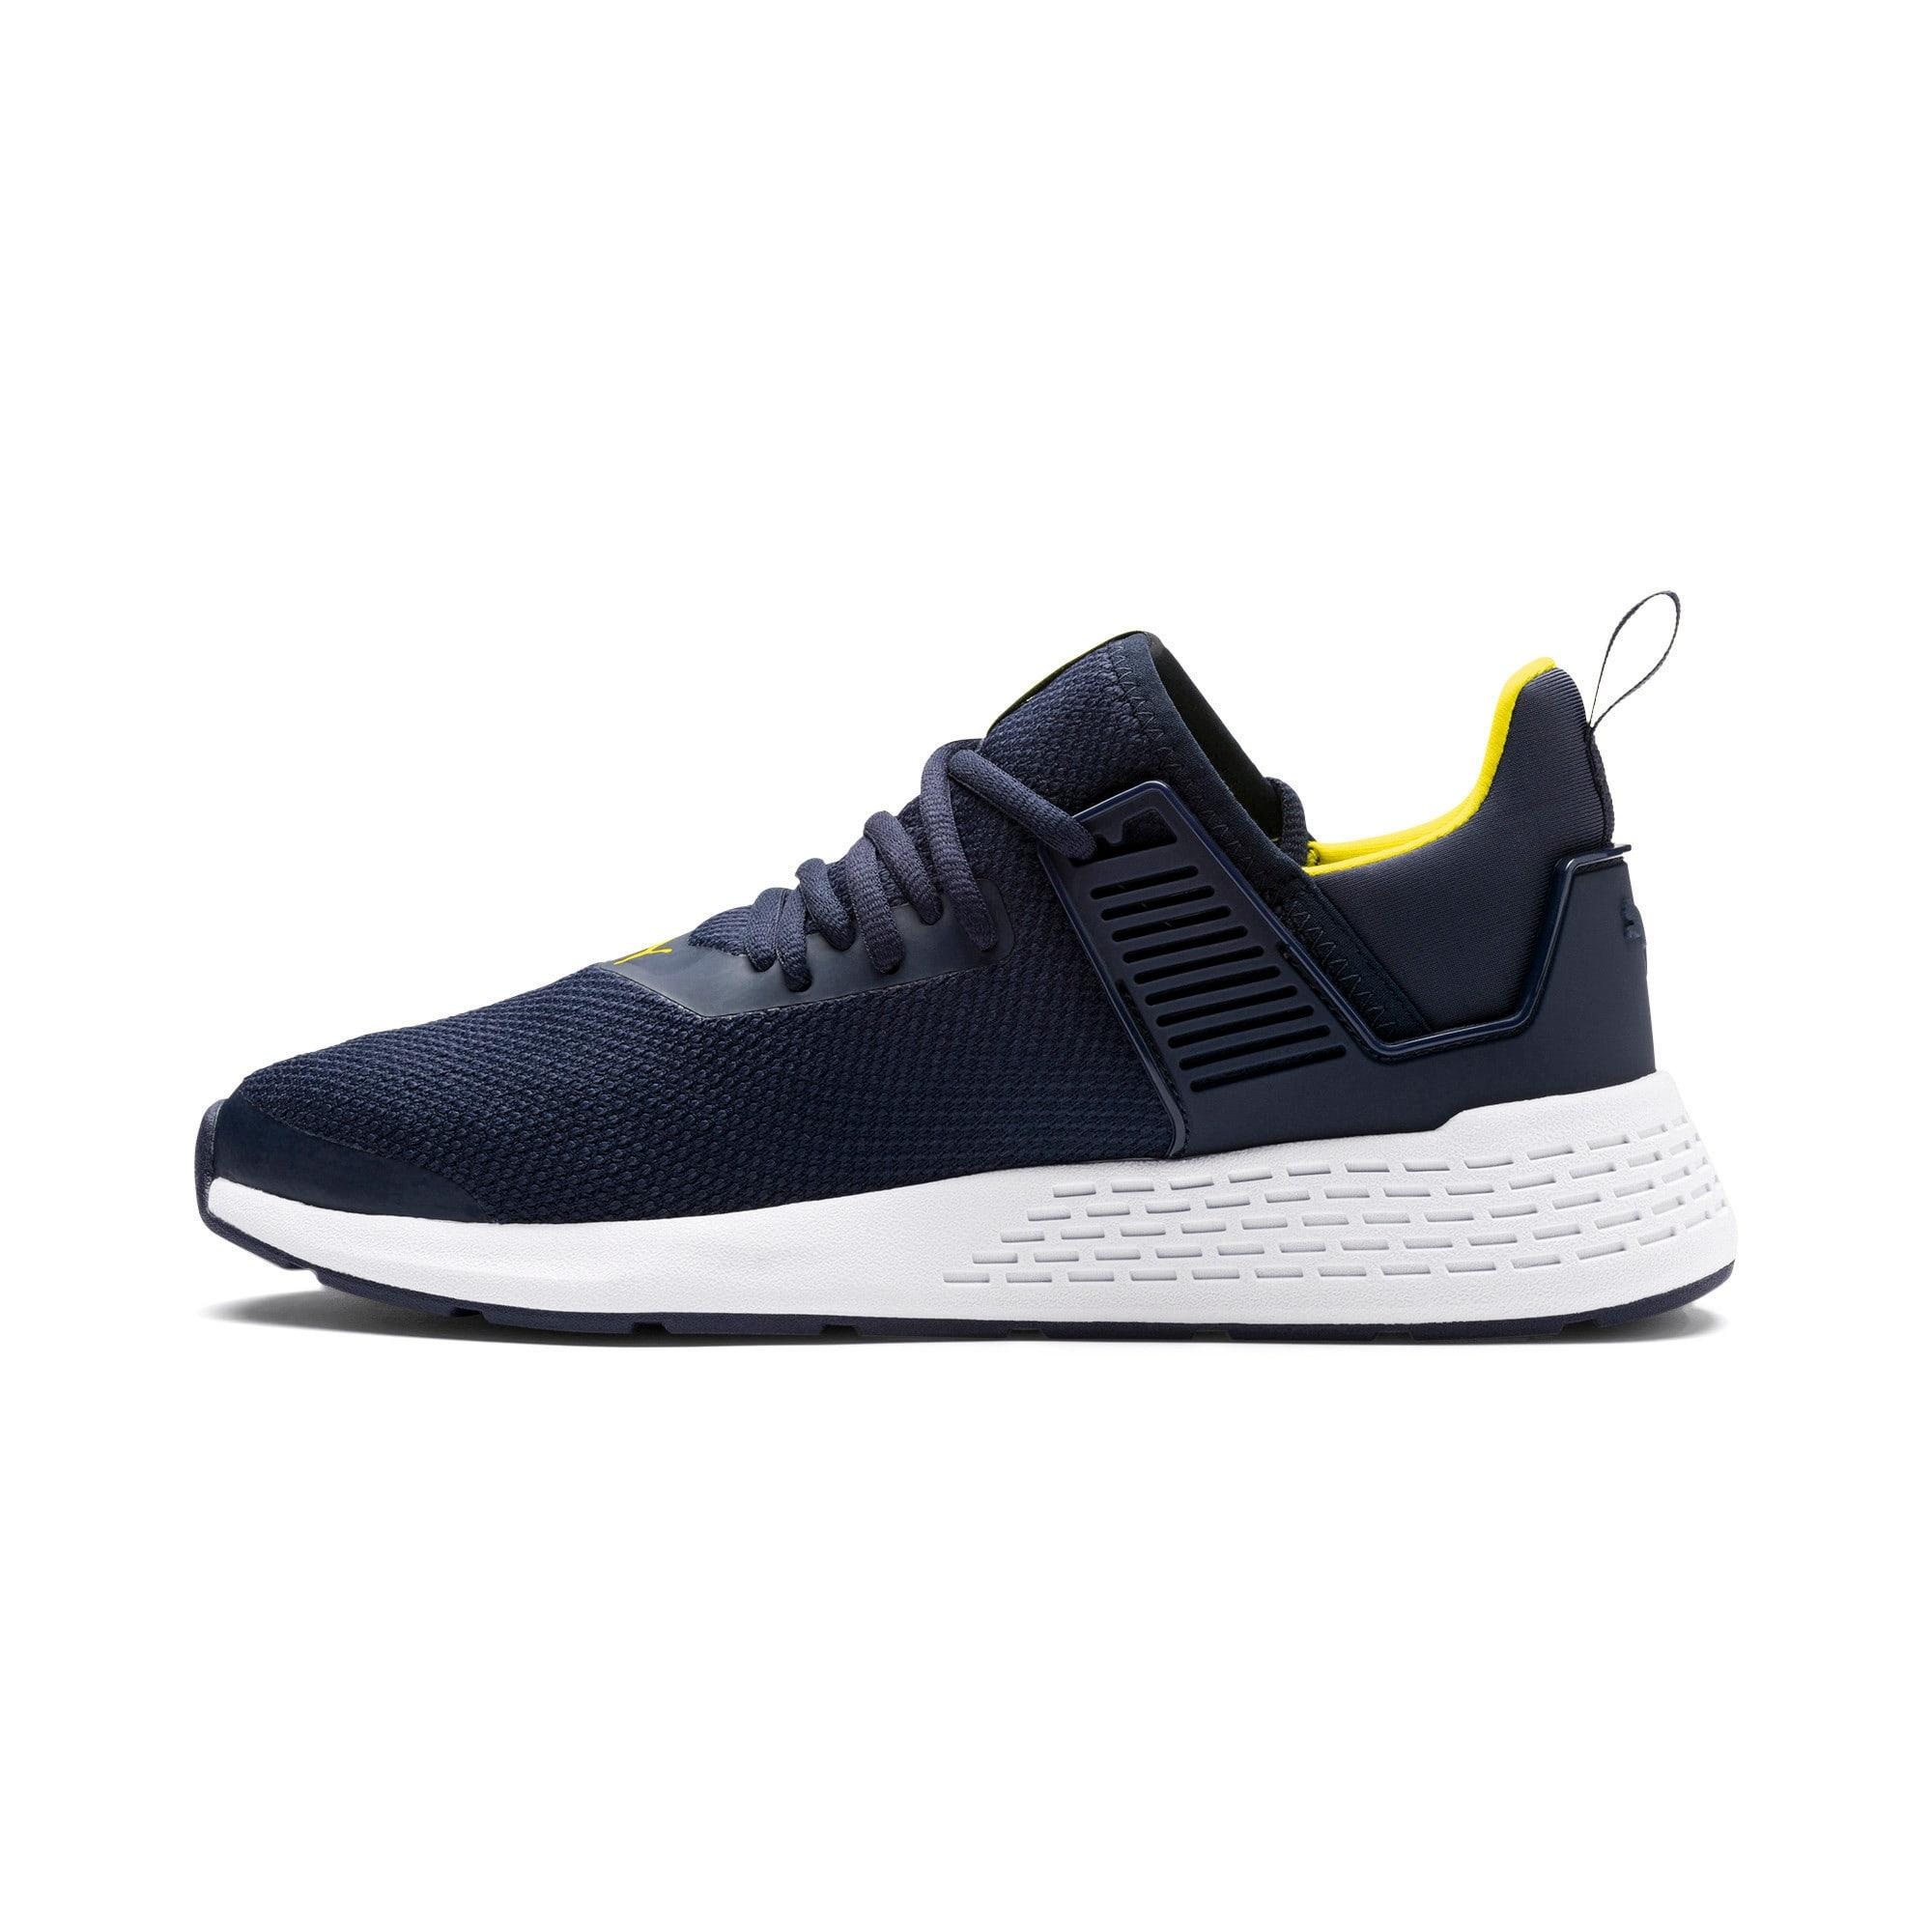 Thumbnail 1 of Insurge Mesh Sneakers, Peacoat-Blazing Yellow-White, medium-IND